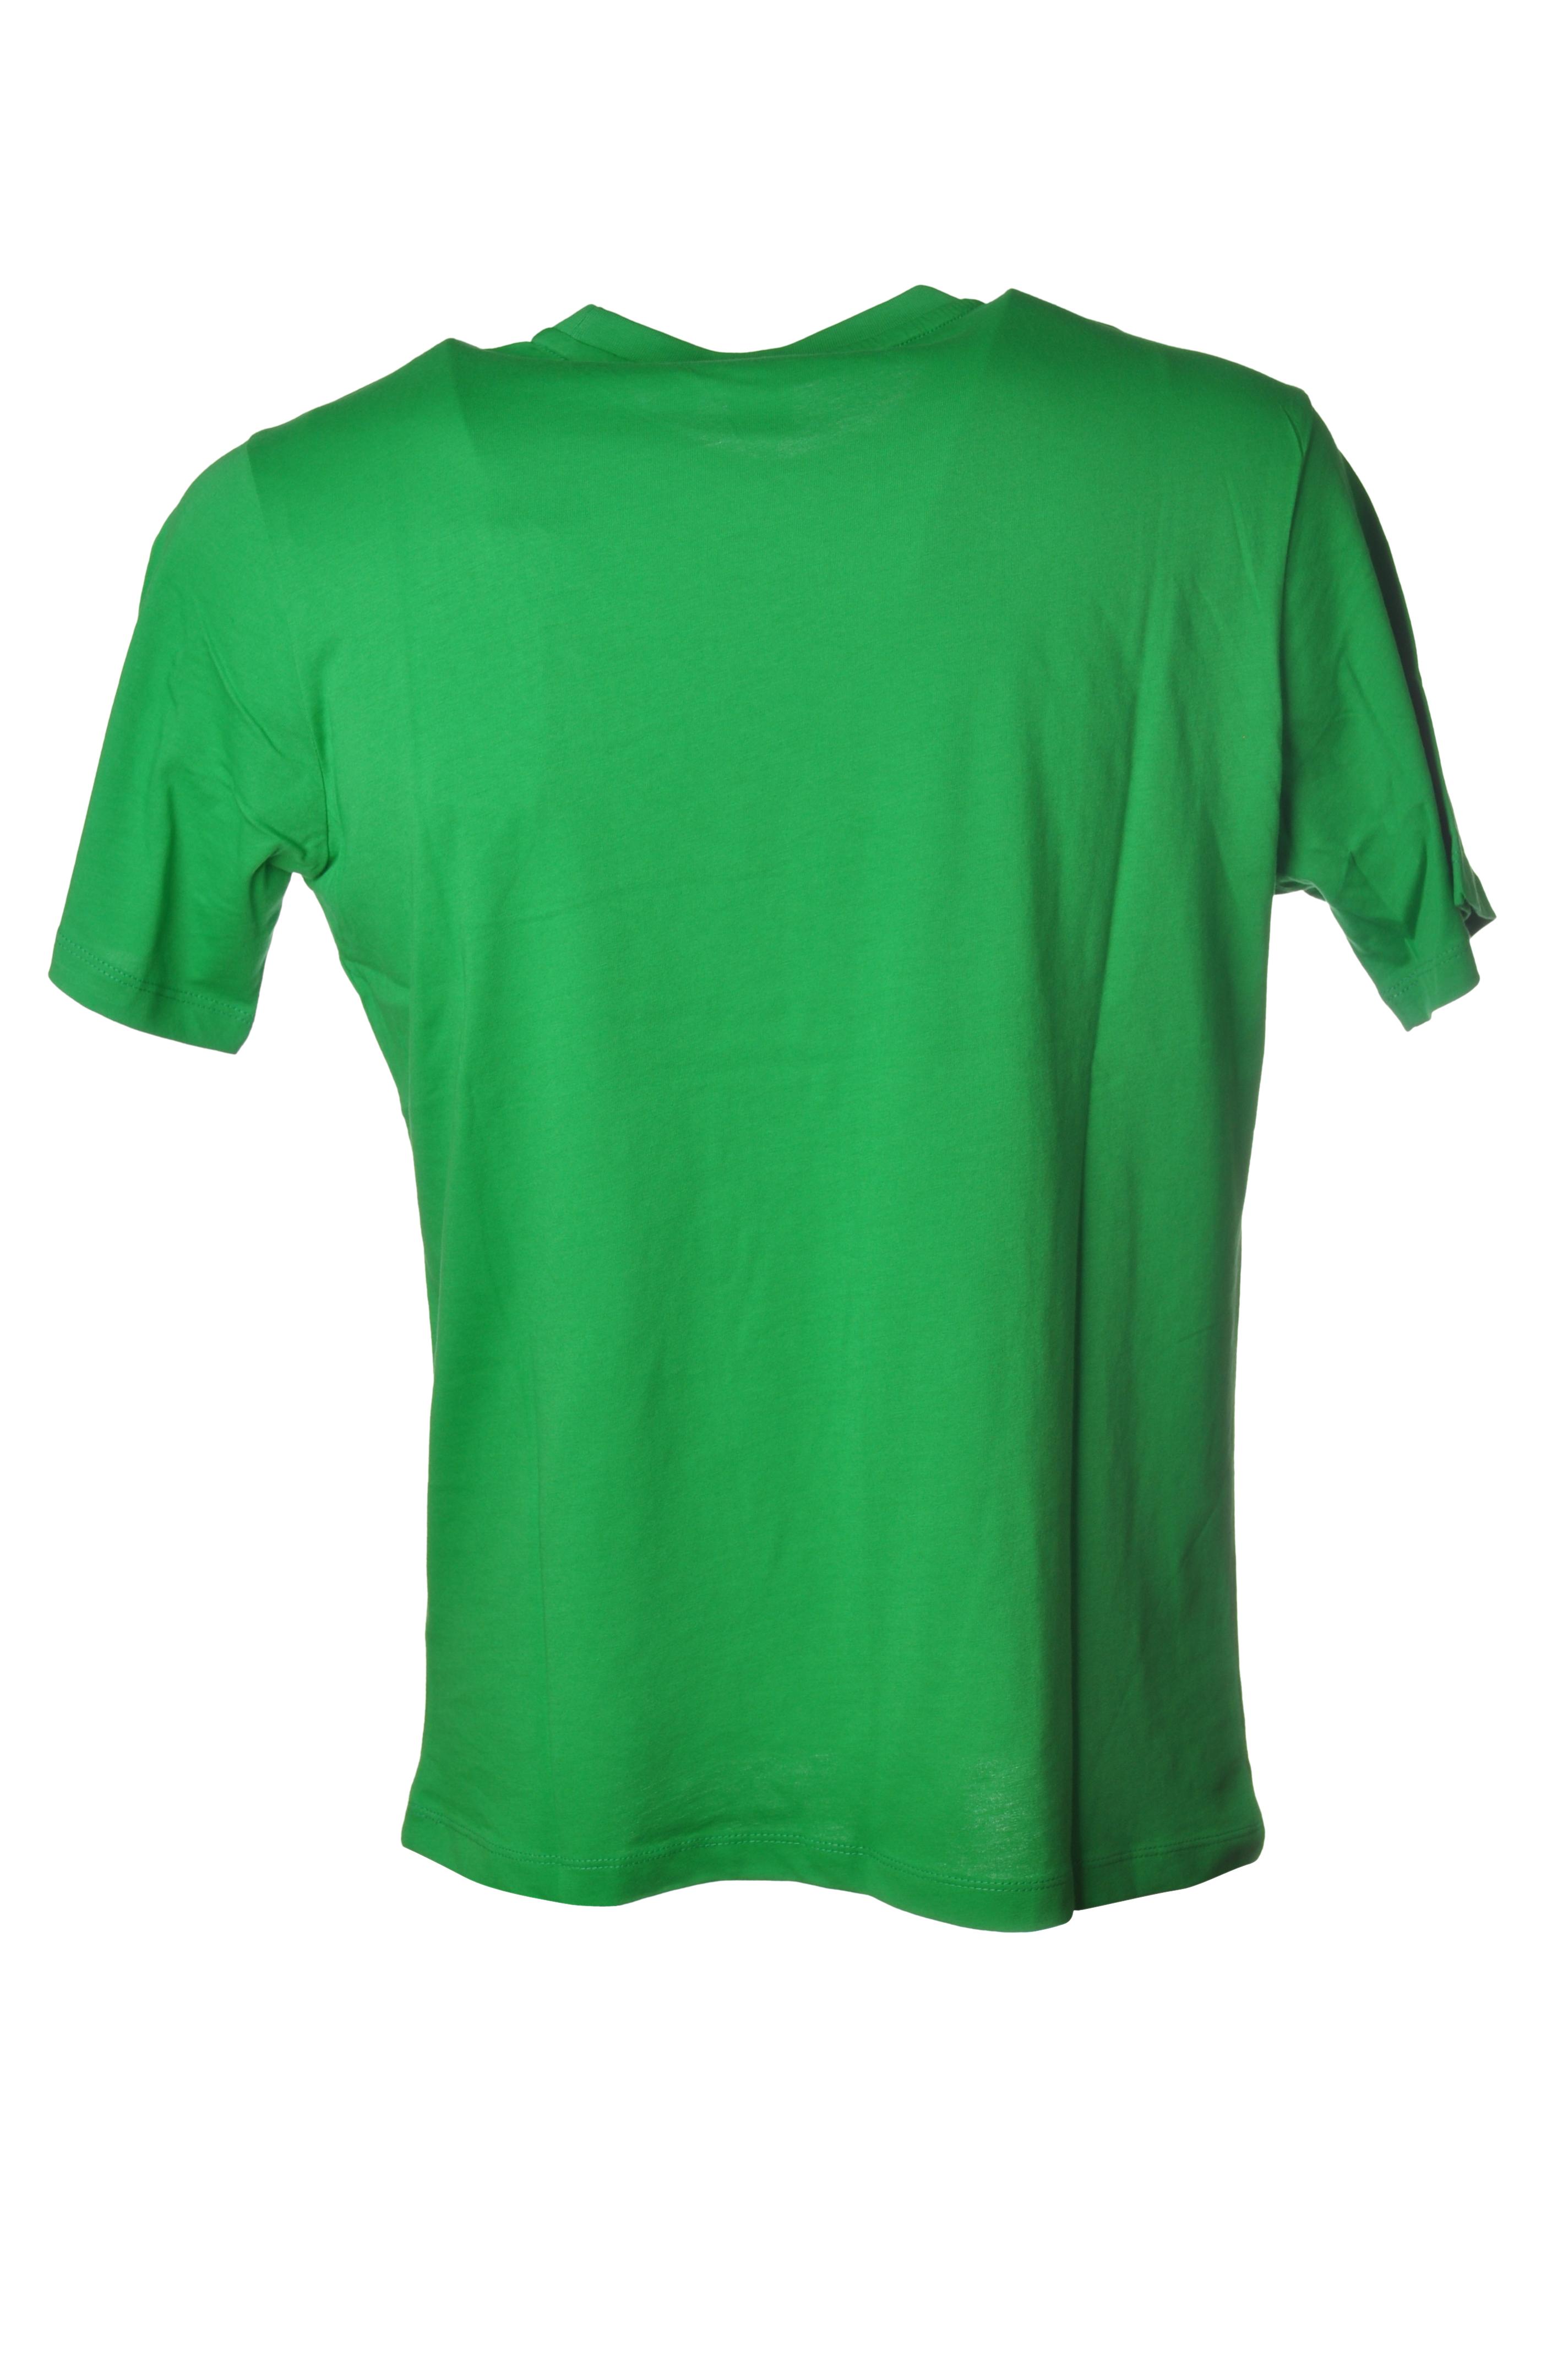 Sergio Tacchini - T-shirts